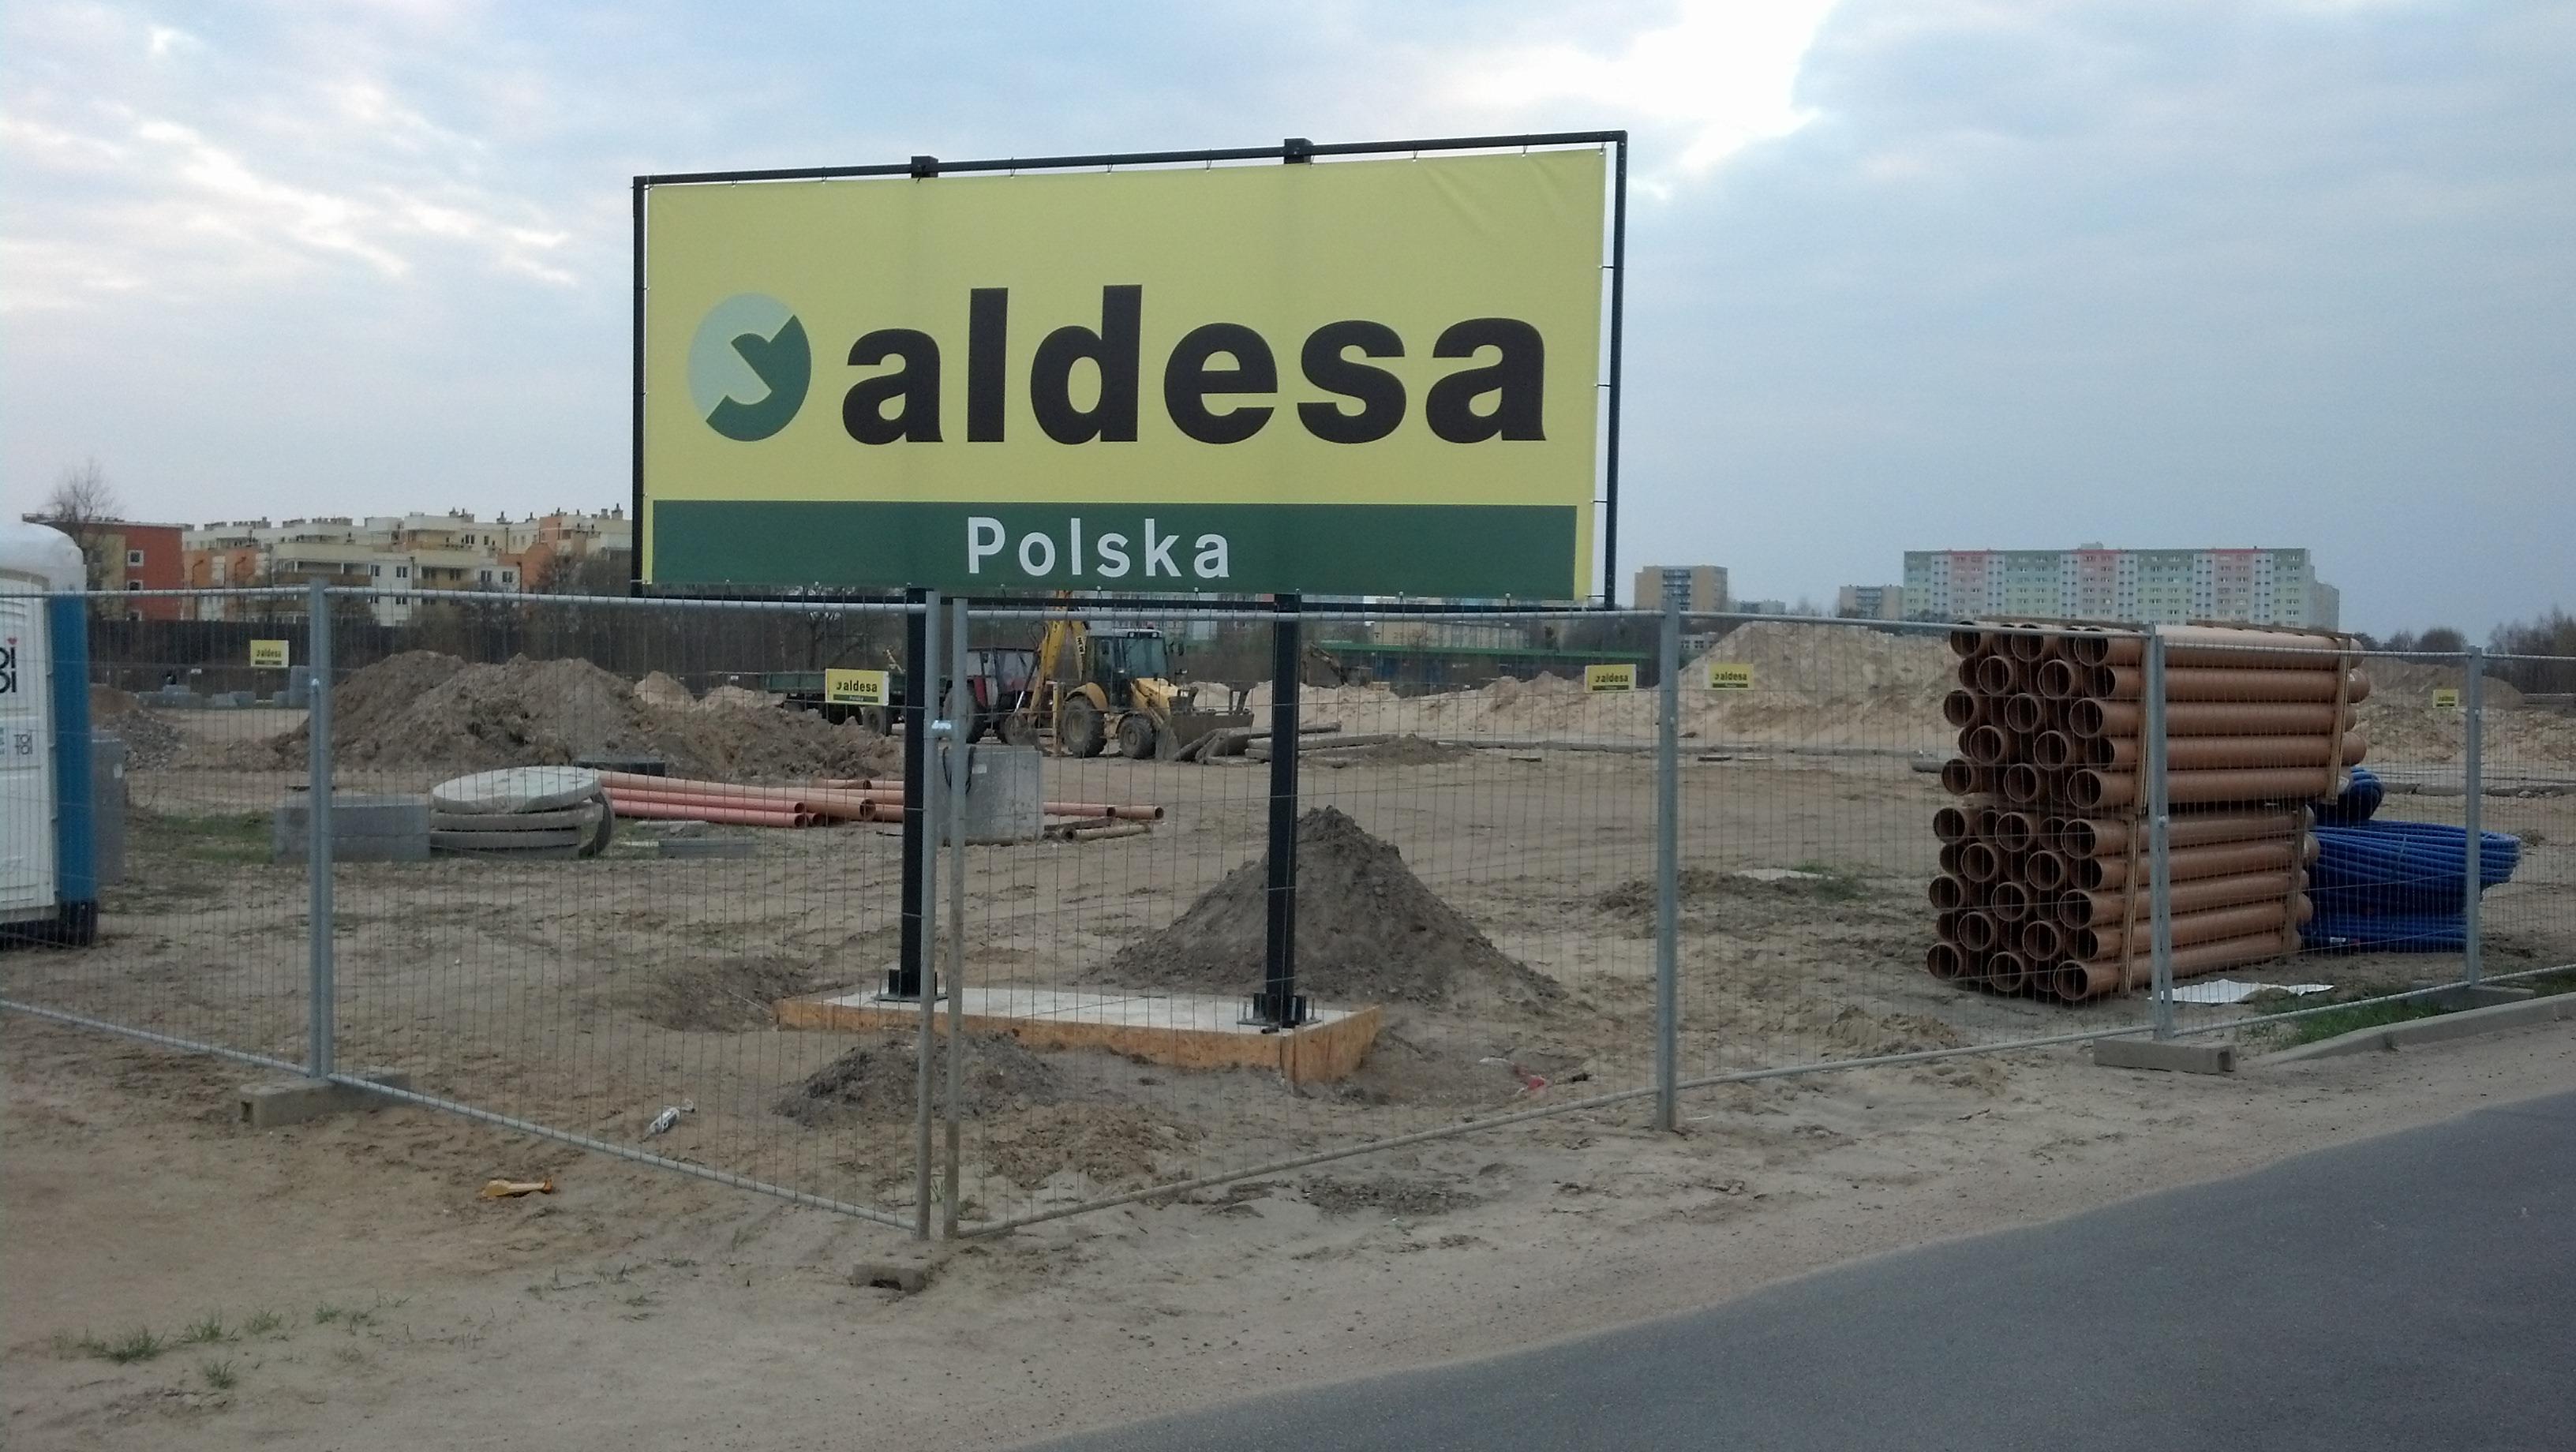 Konstrukcja reklamowa na fundamencie Aldesa